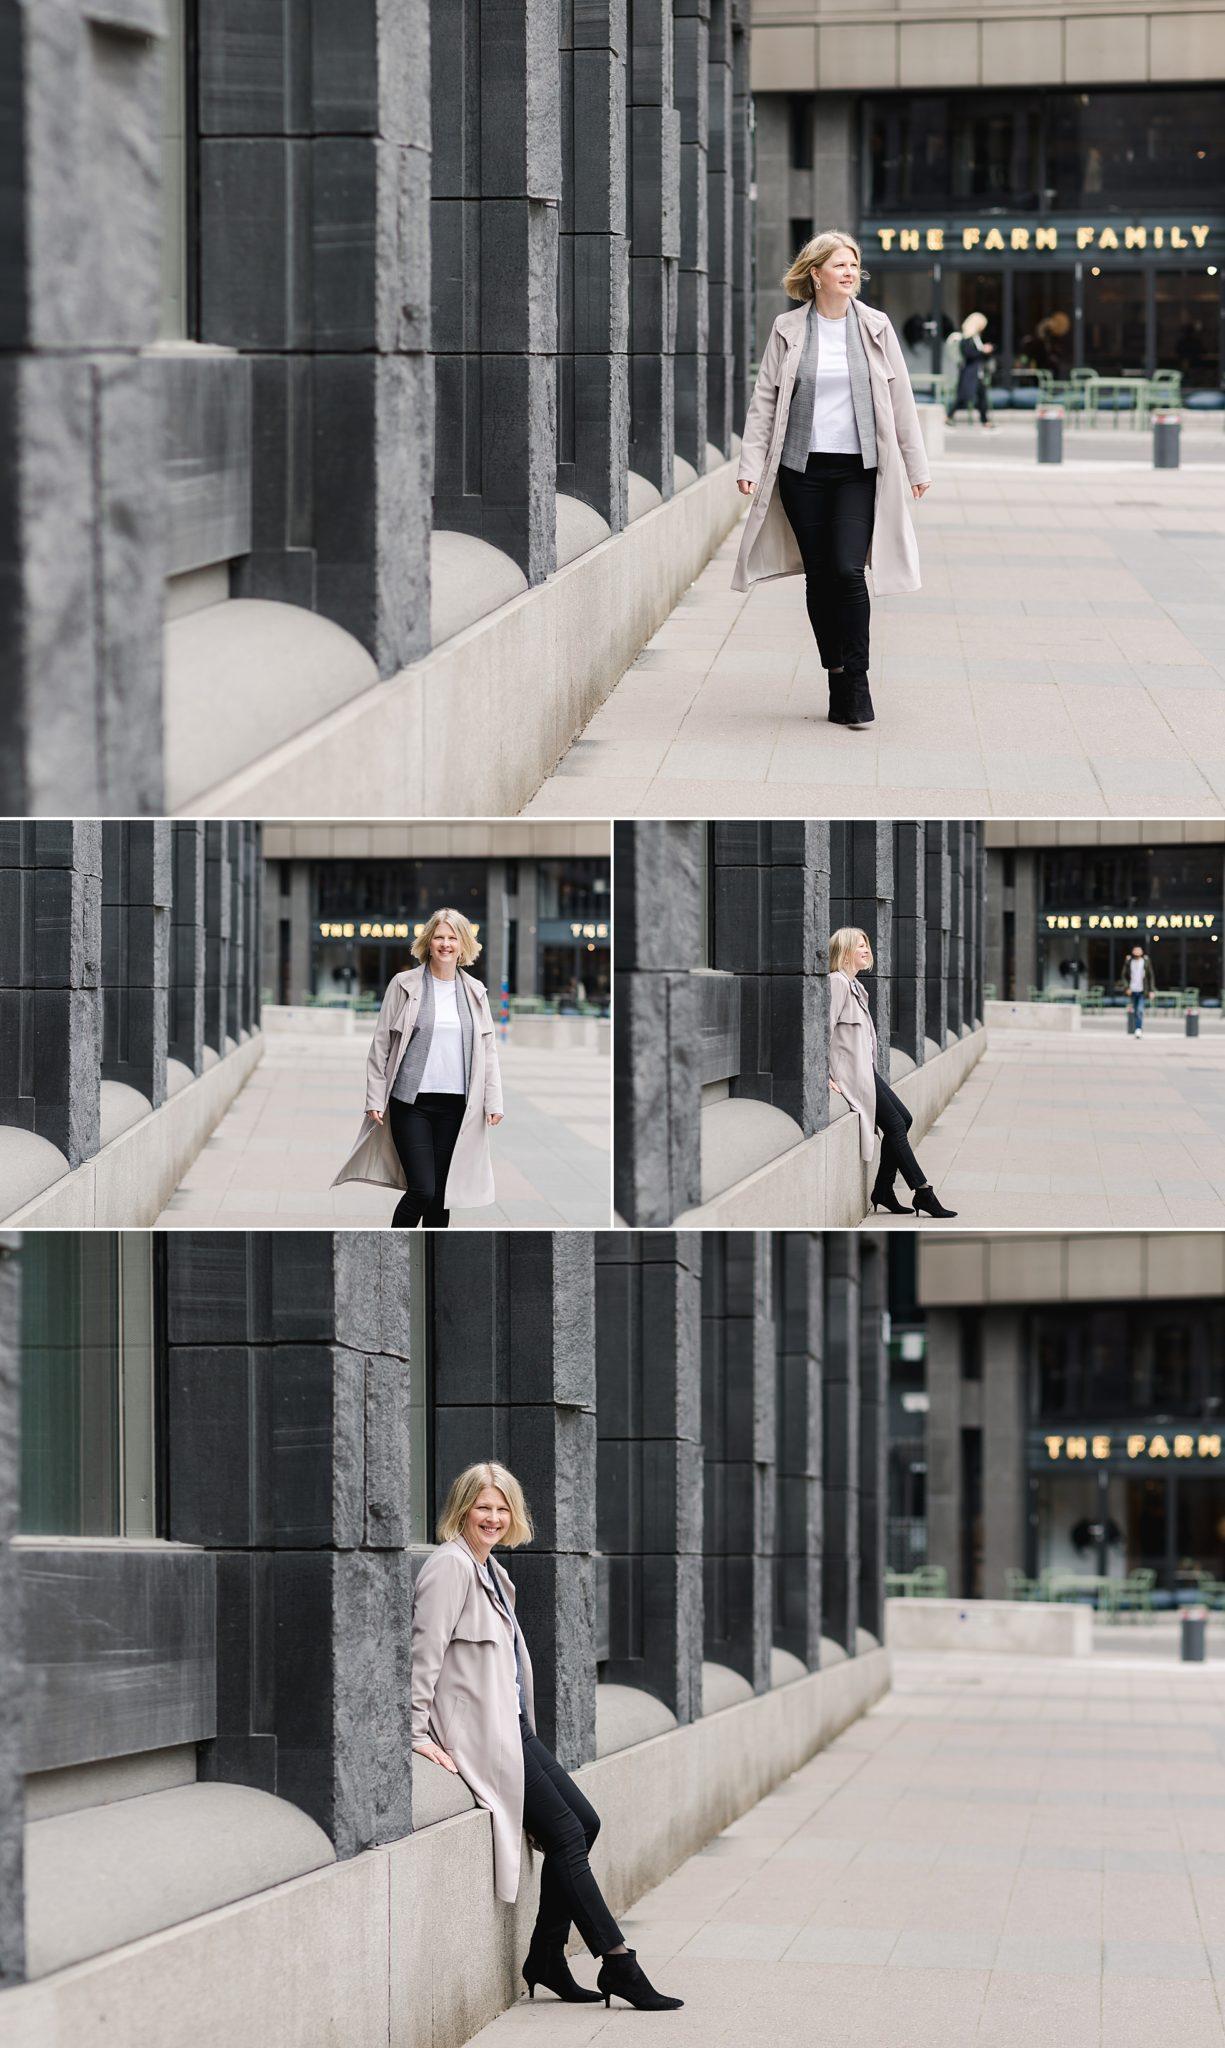 A female IT professional at Brunkebergstog, a beautiful photo shoot location